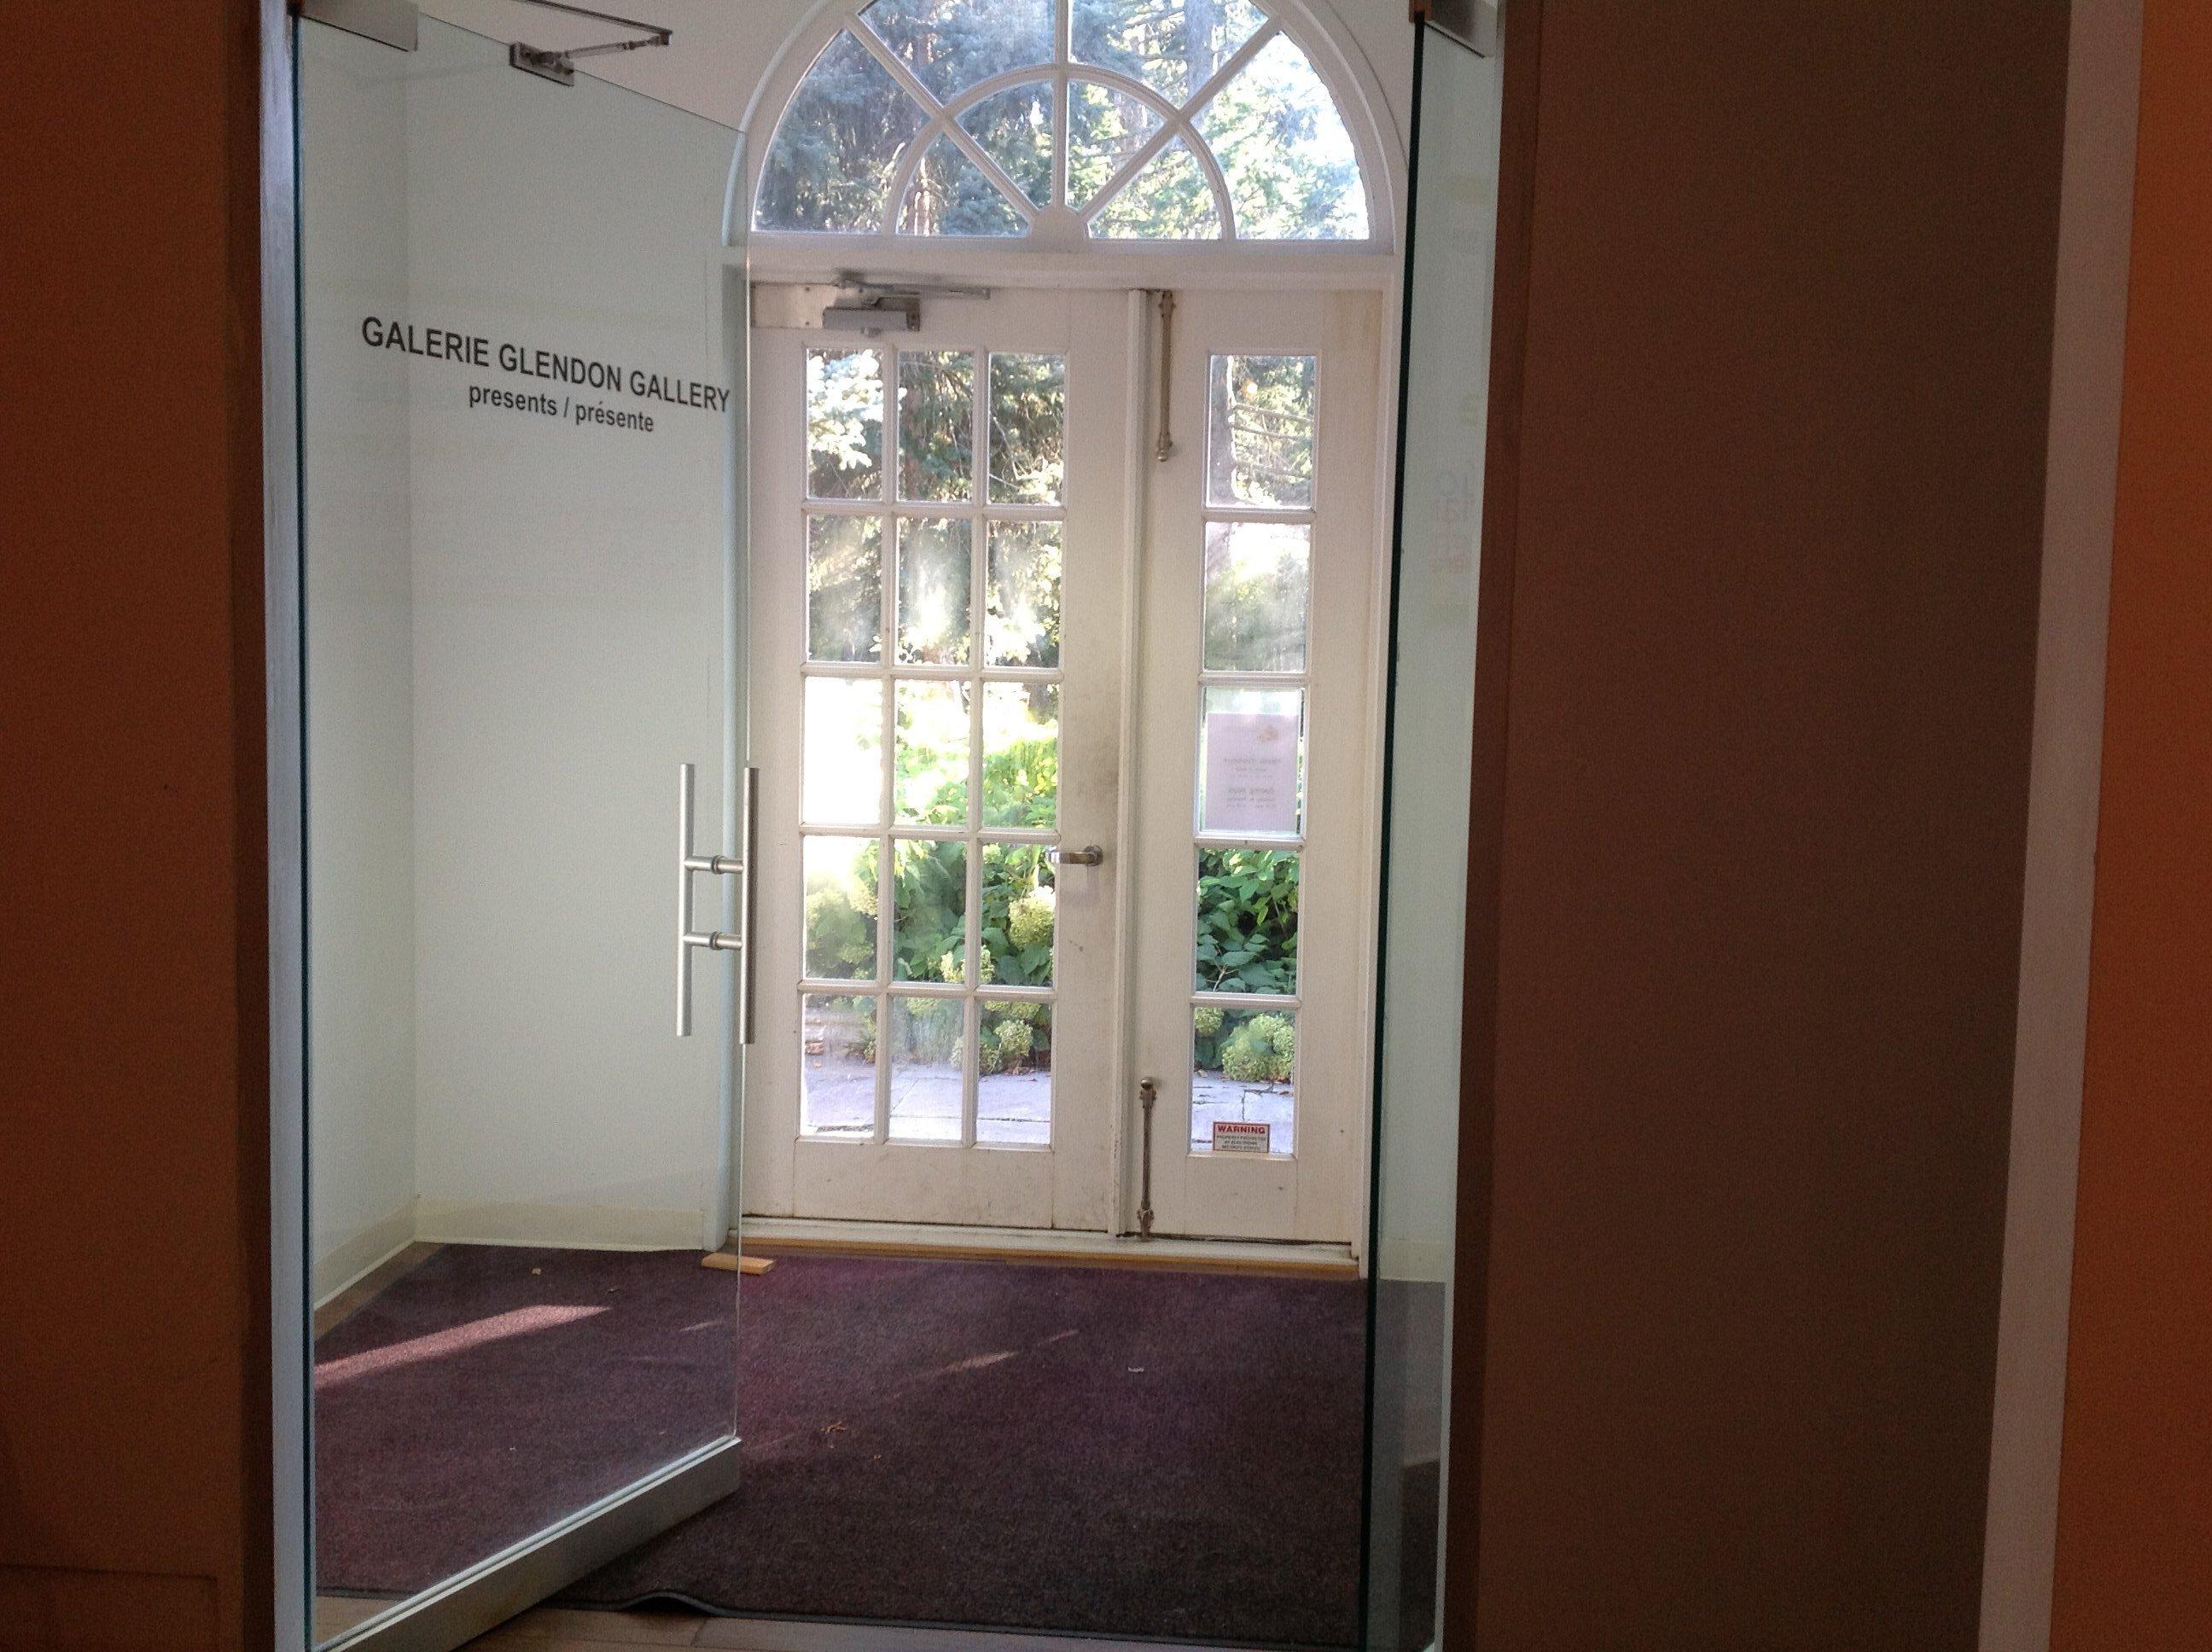 Galerie Glendon Gallery 2016_3